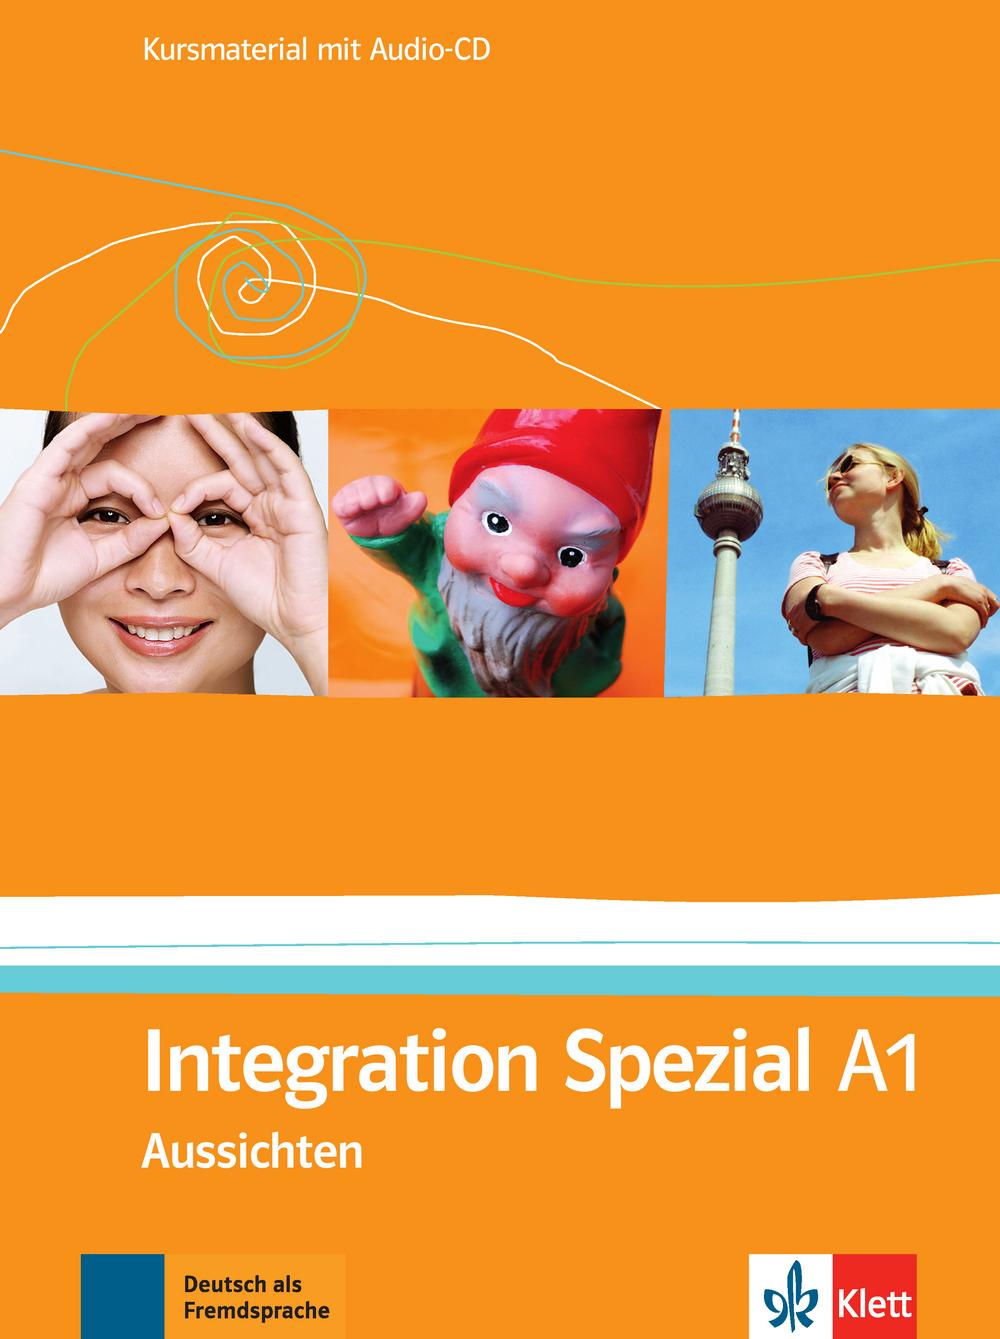 Integration Spezial A1